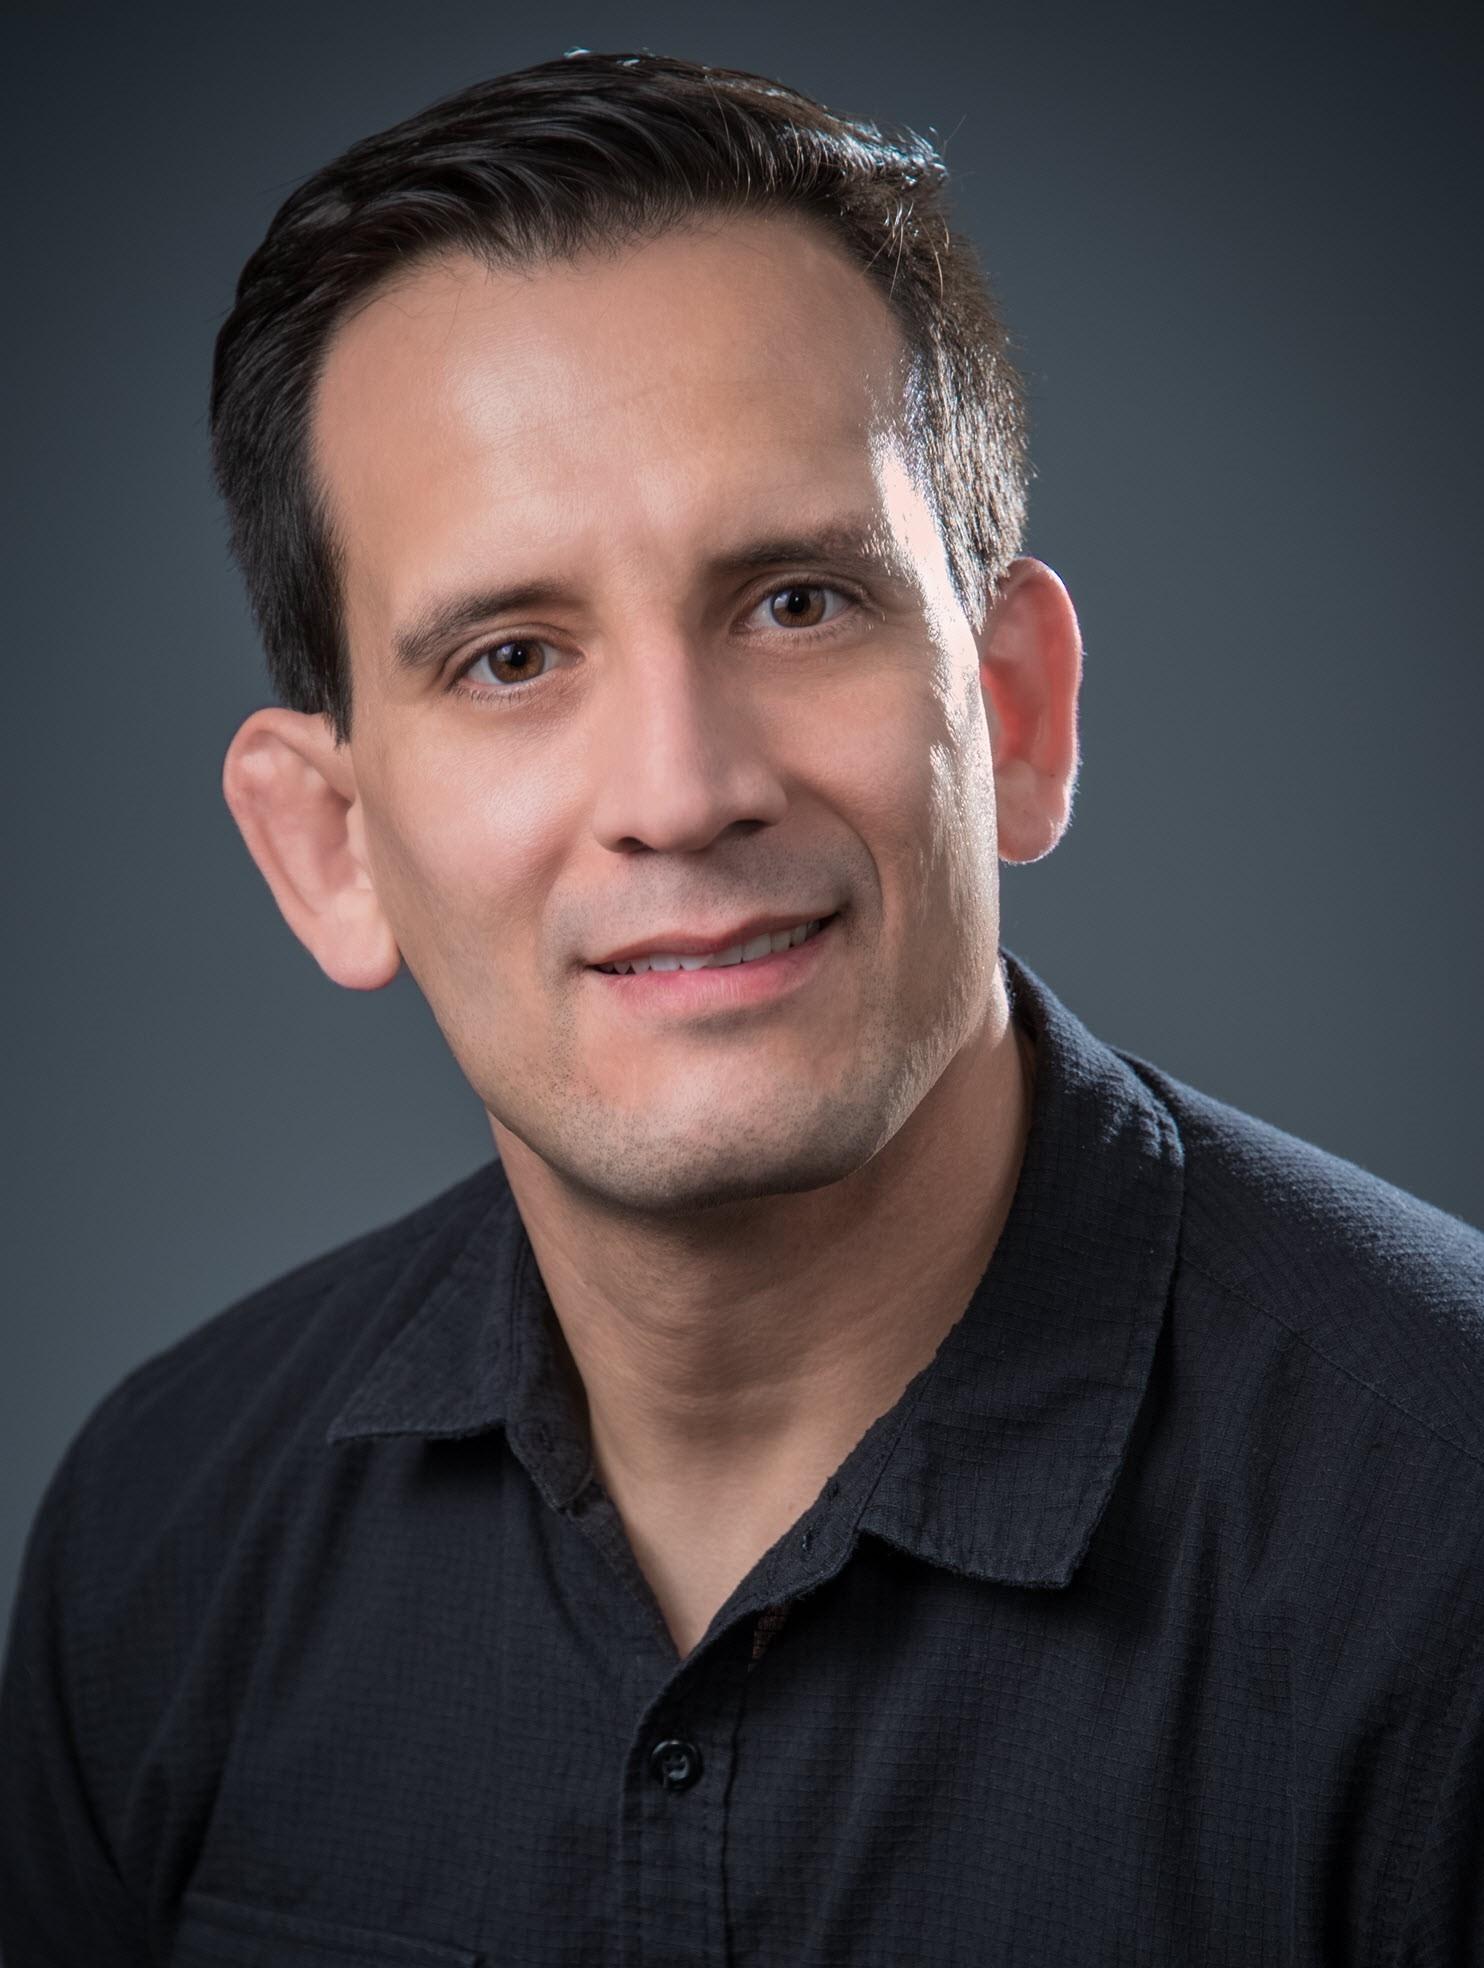 Cristian Lopez Villegas / South Mountain Community College profile photo